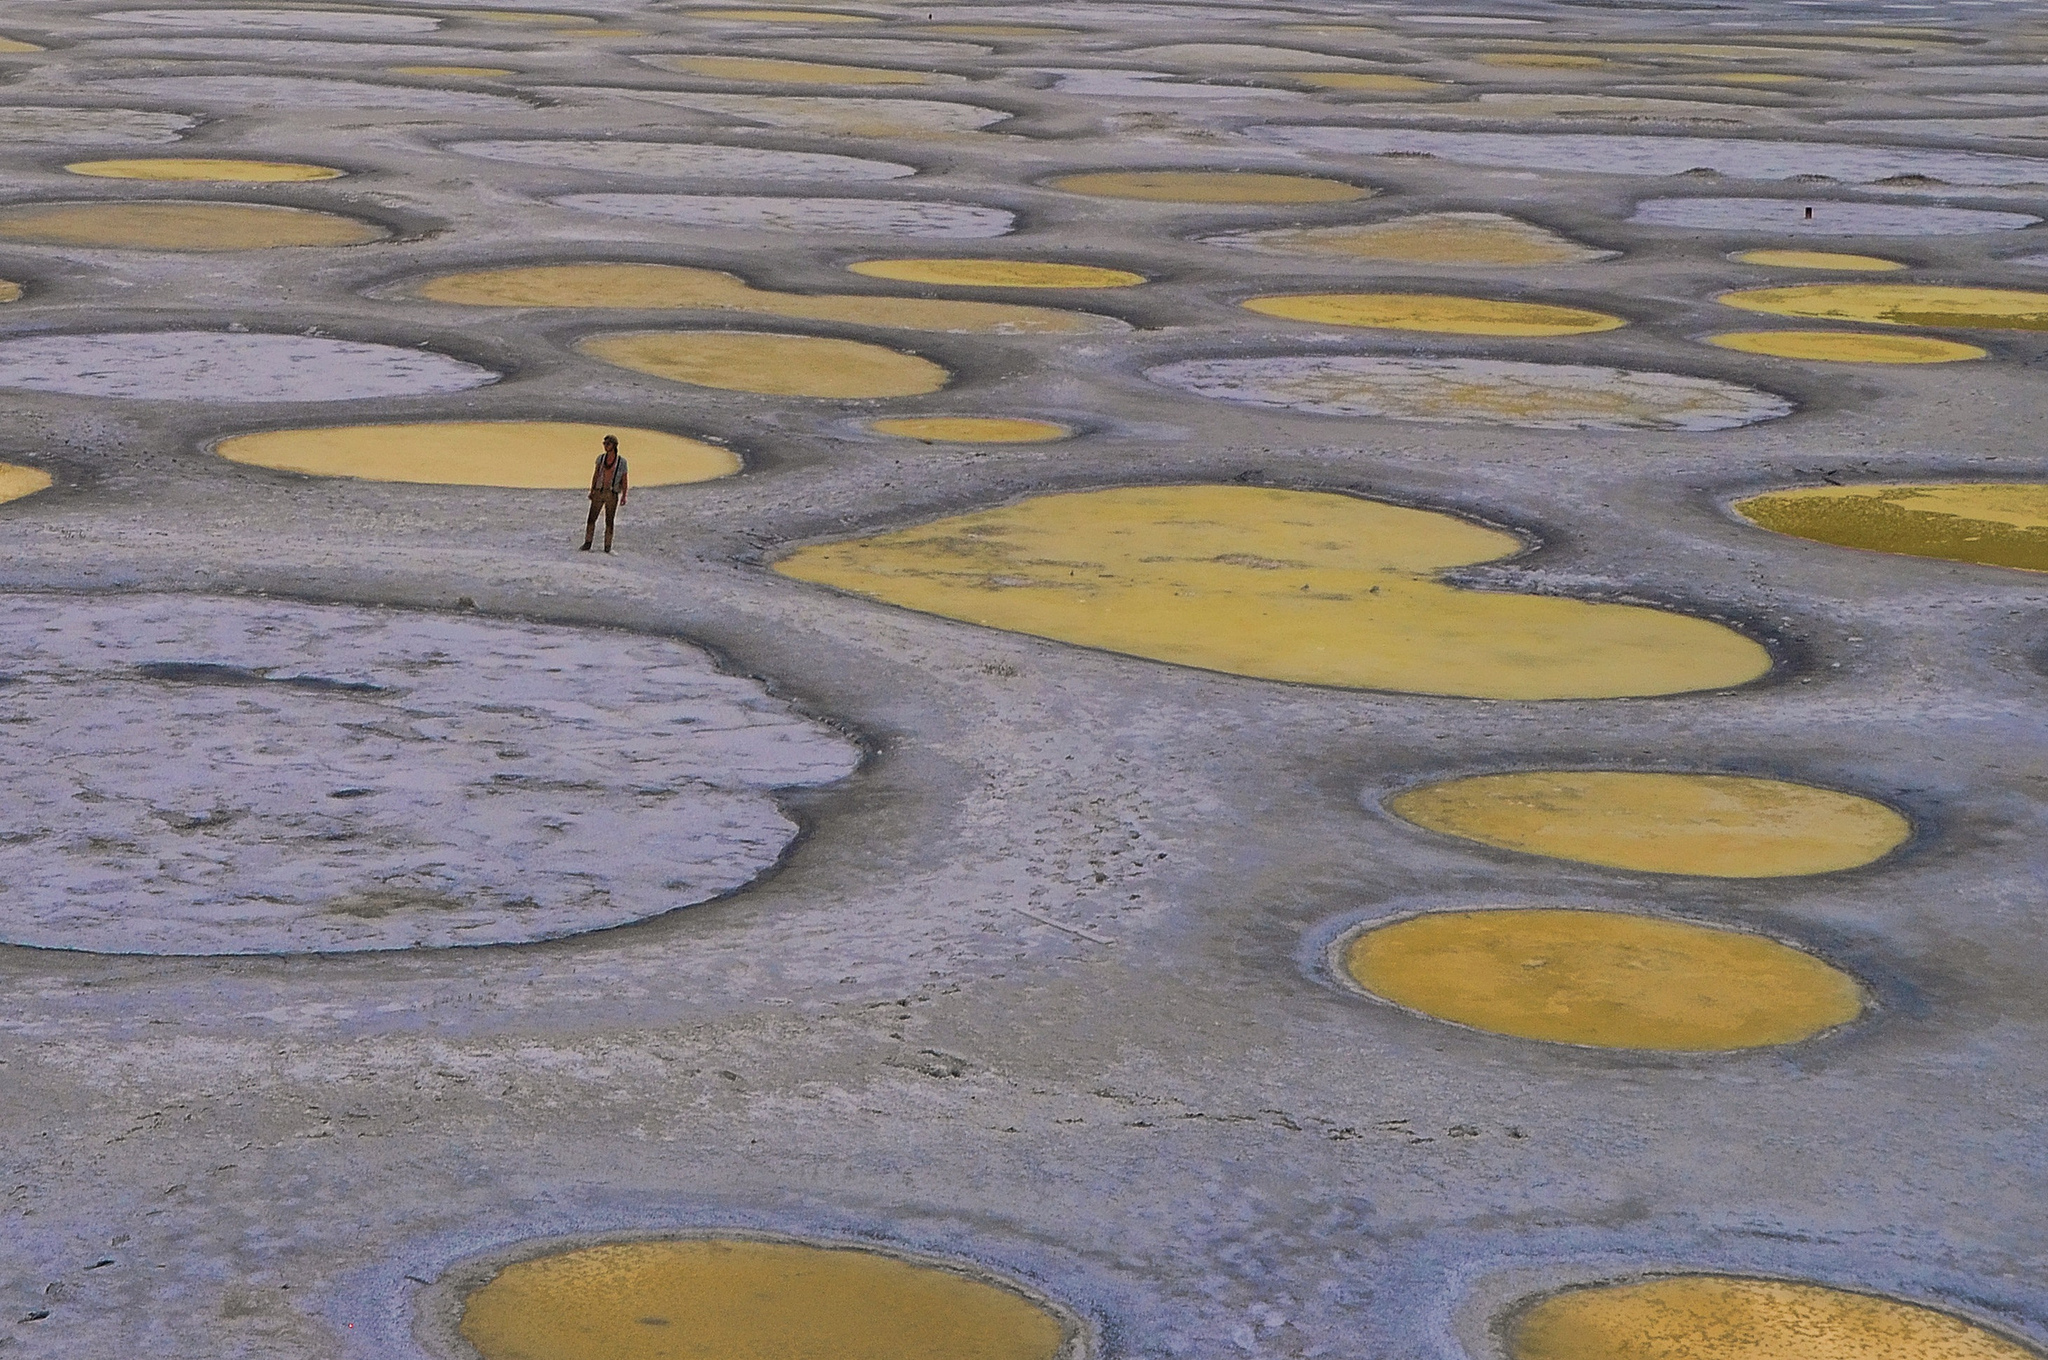 Spotted Lake, colombie britannique, canada